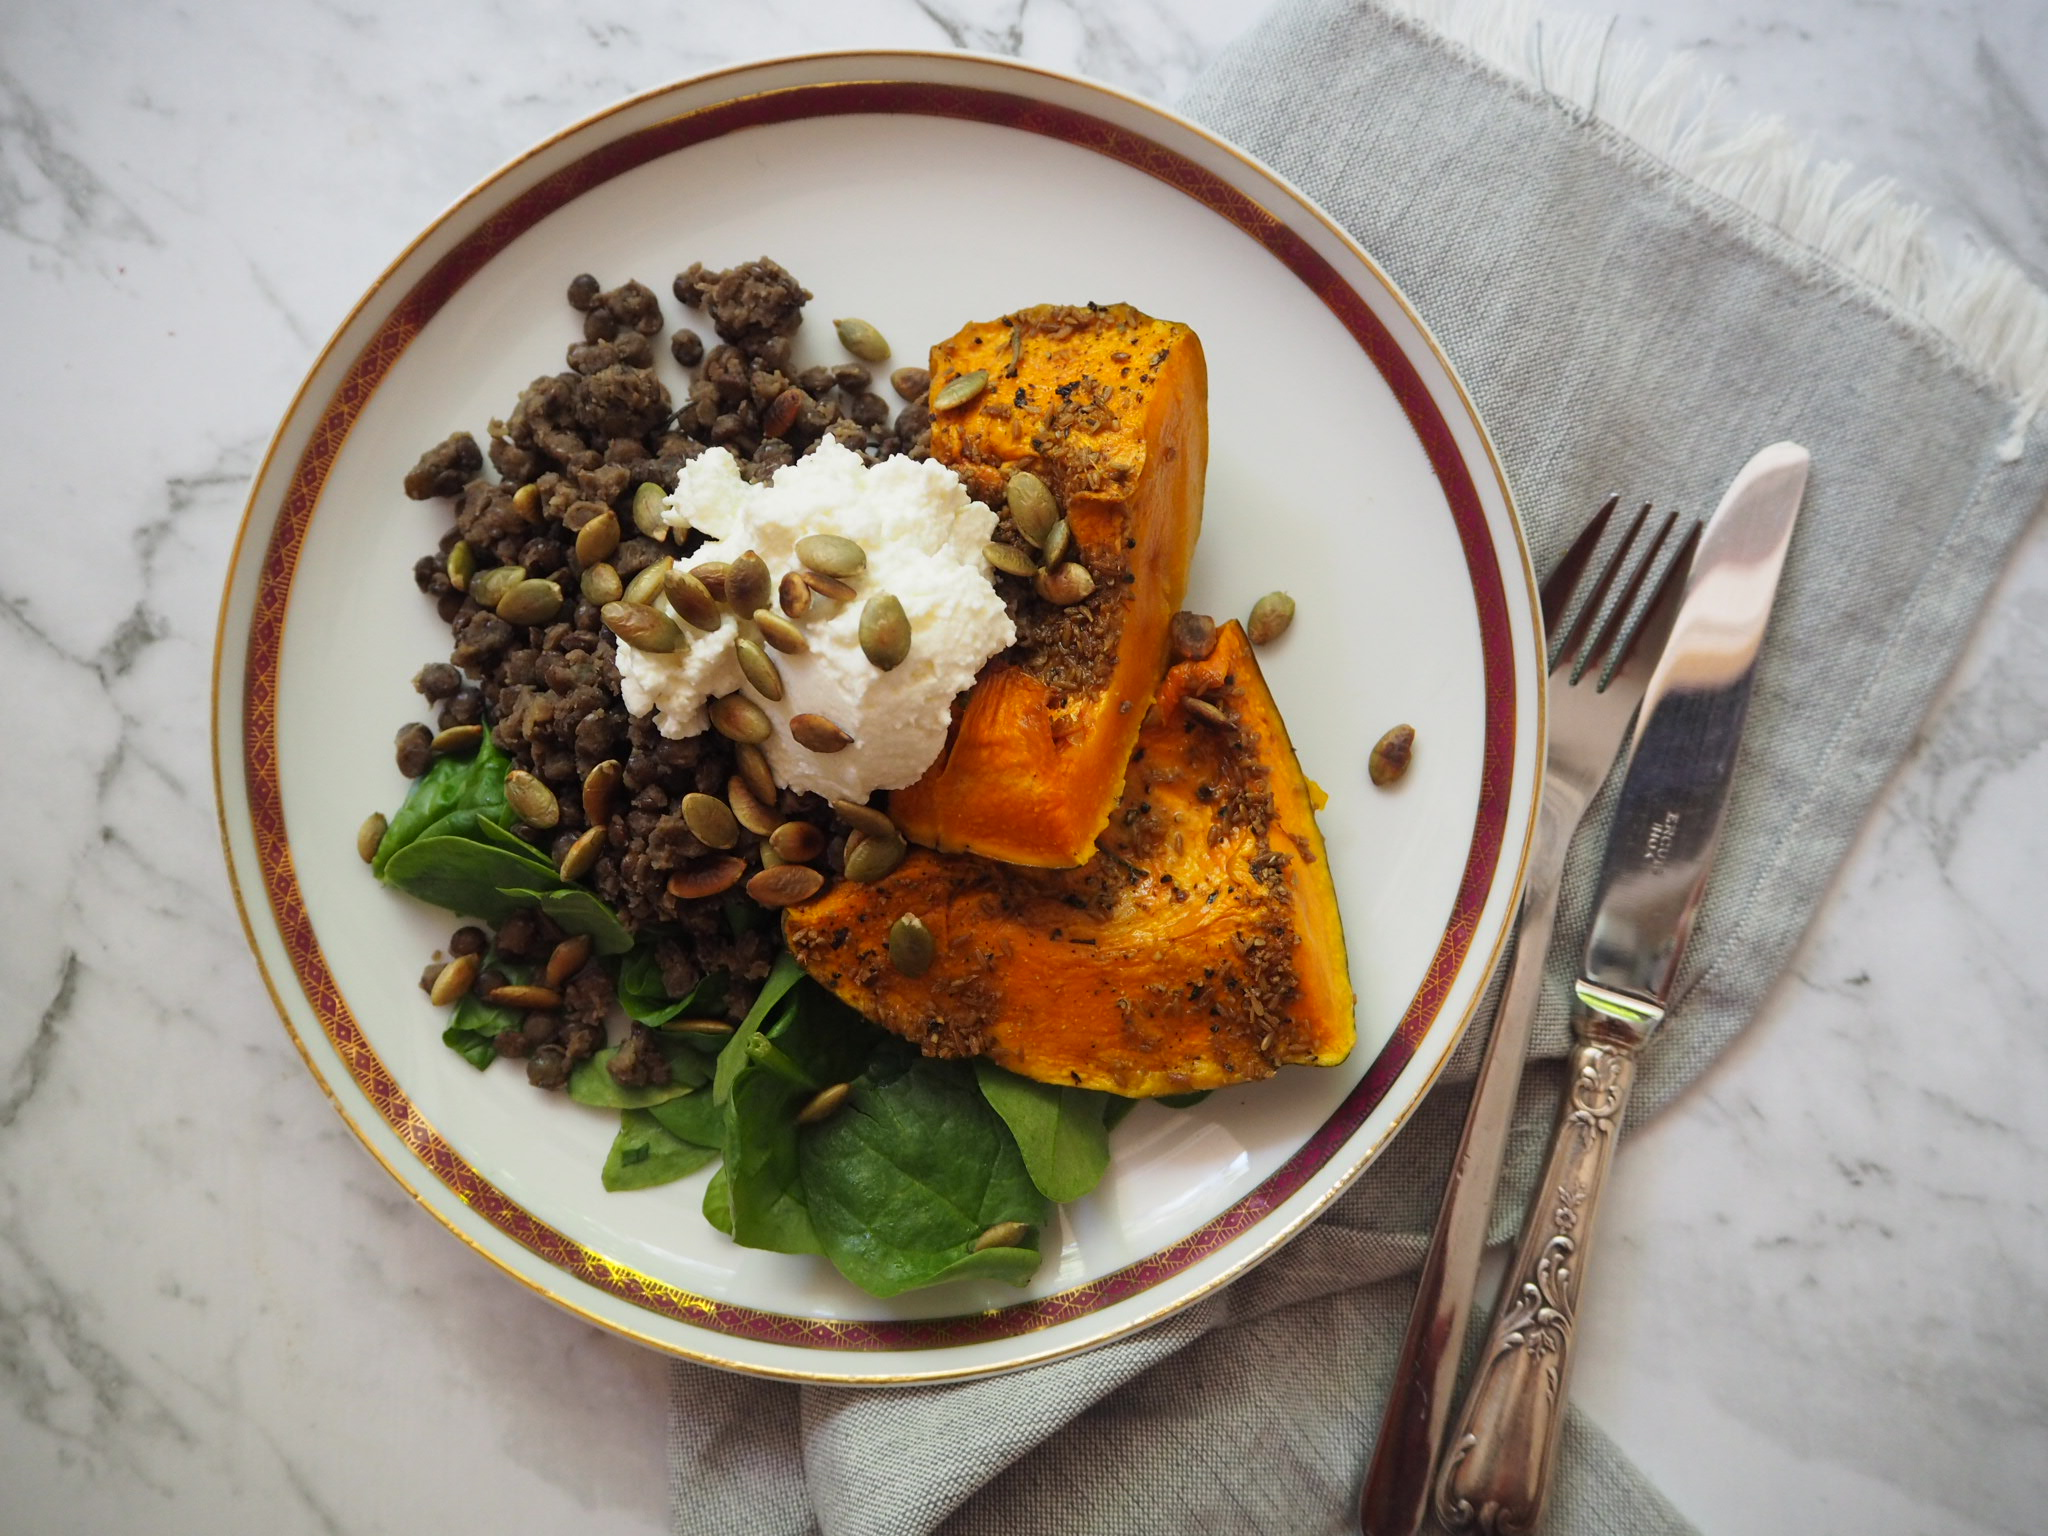 spiced pumpkin and lentils